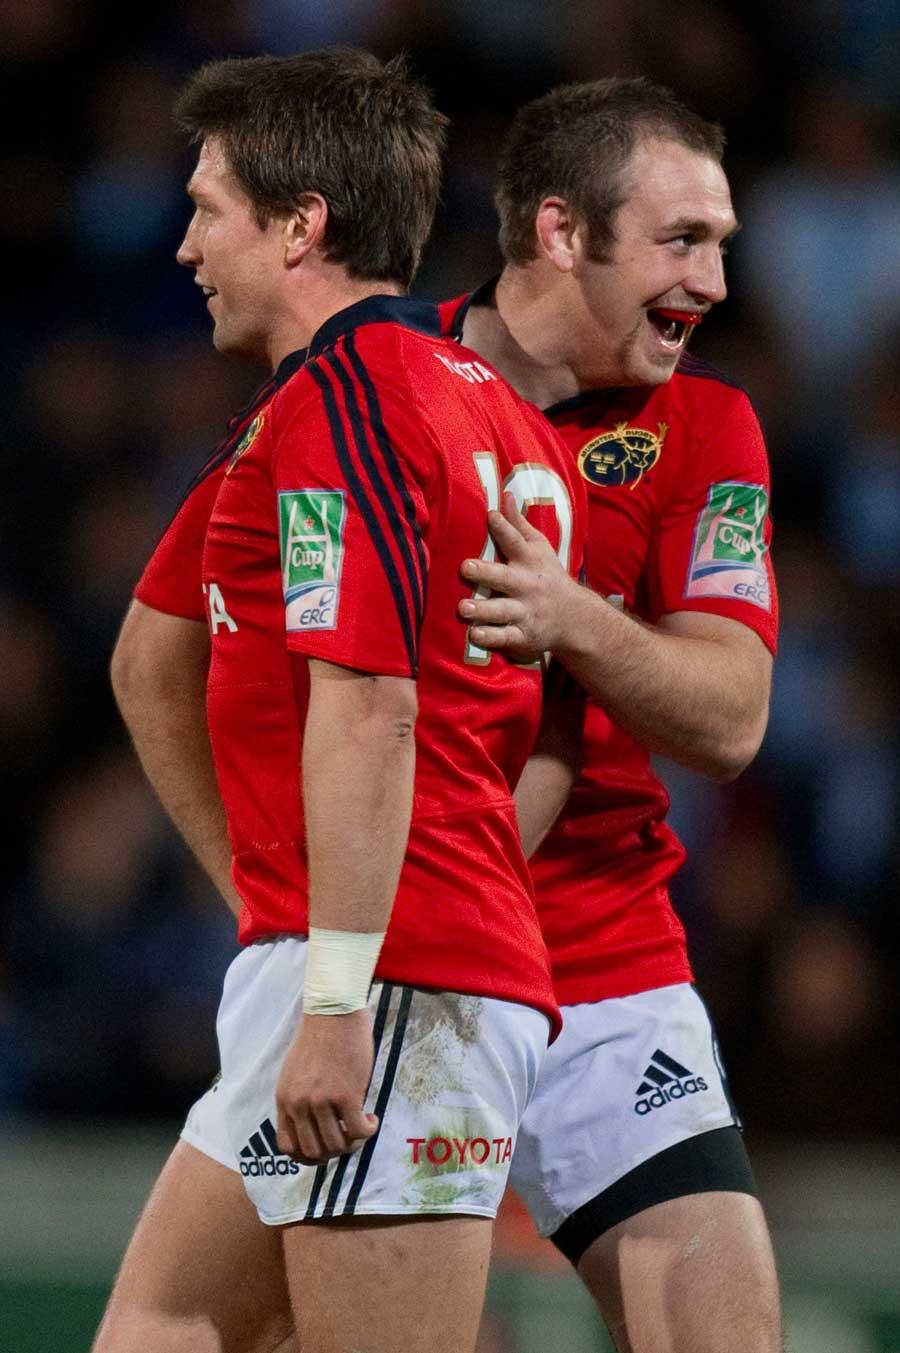 Munster's Ronan O'Gara celebrates his last minute drop-goal against Castres